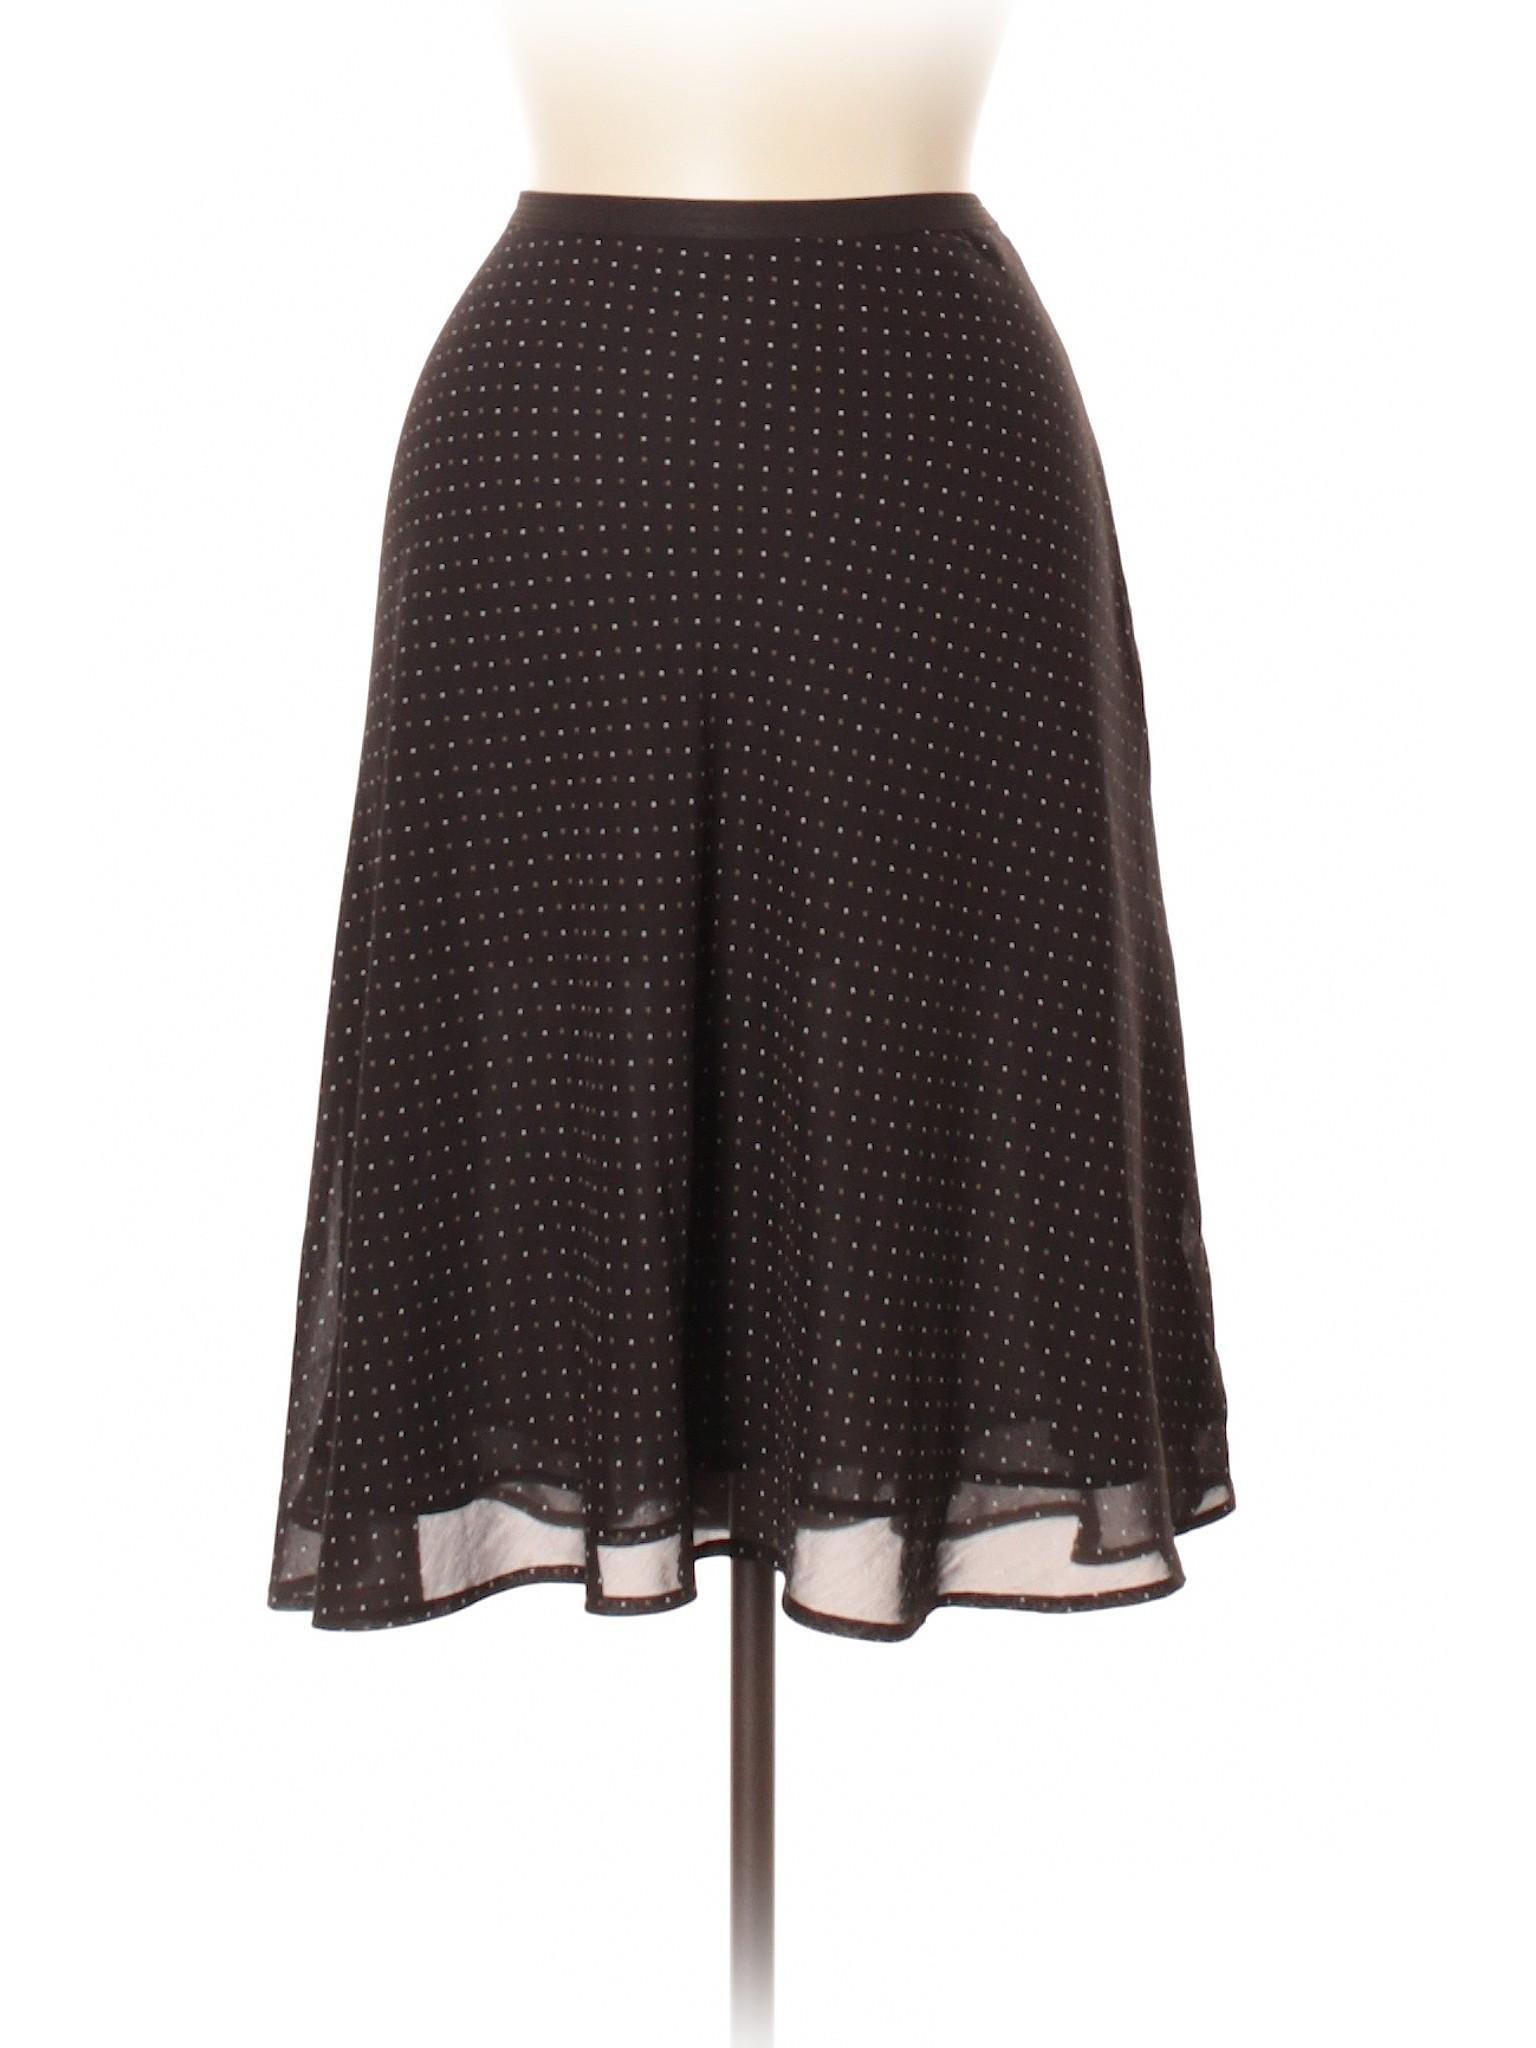 Casual Boutique Boutique Boutique Skirt Casual Boutique Casual Skirt Skirt Casual w8xF6wq